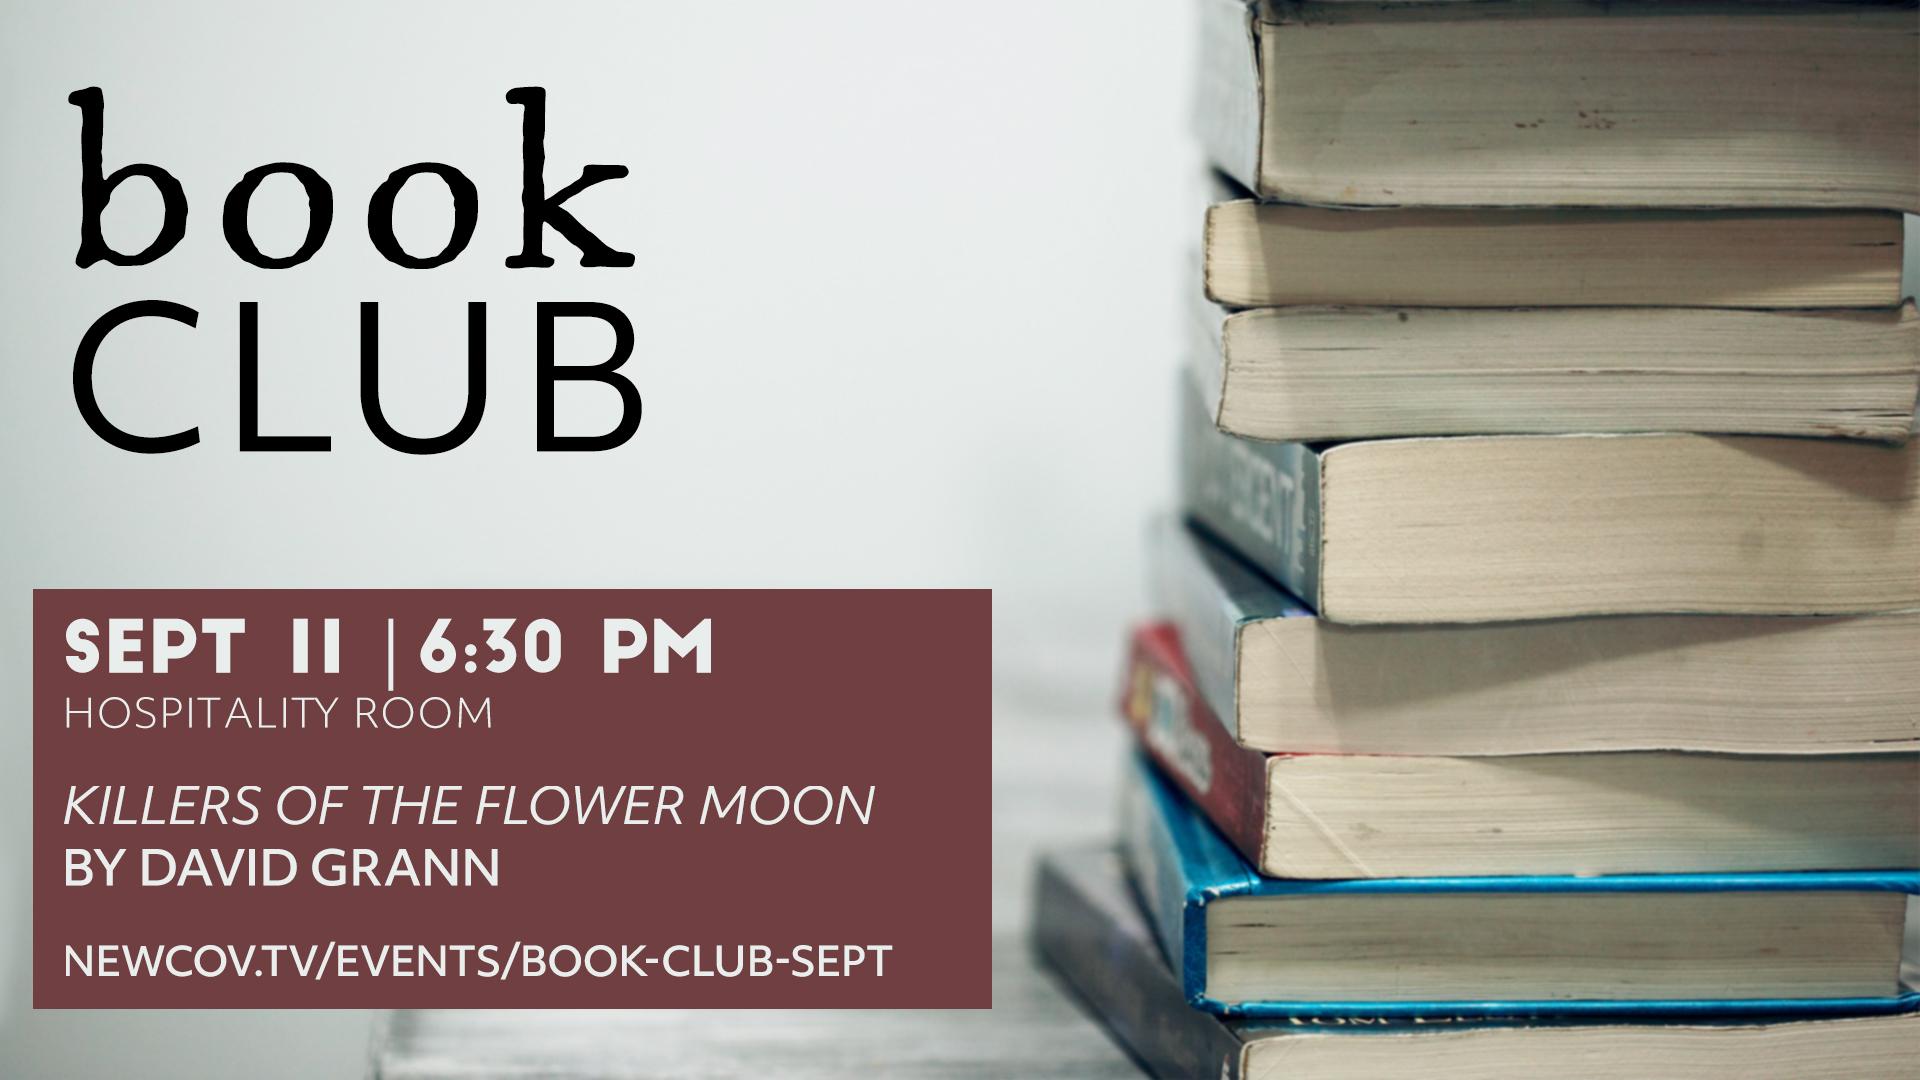 OWLS-Book-Club-Sept.jpg